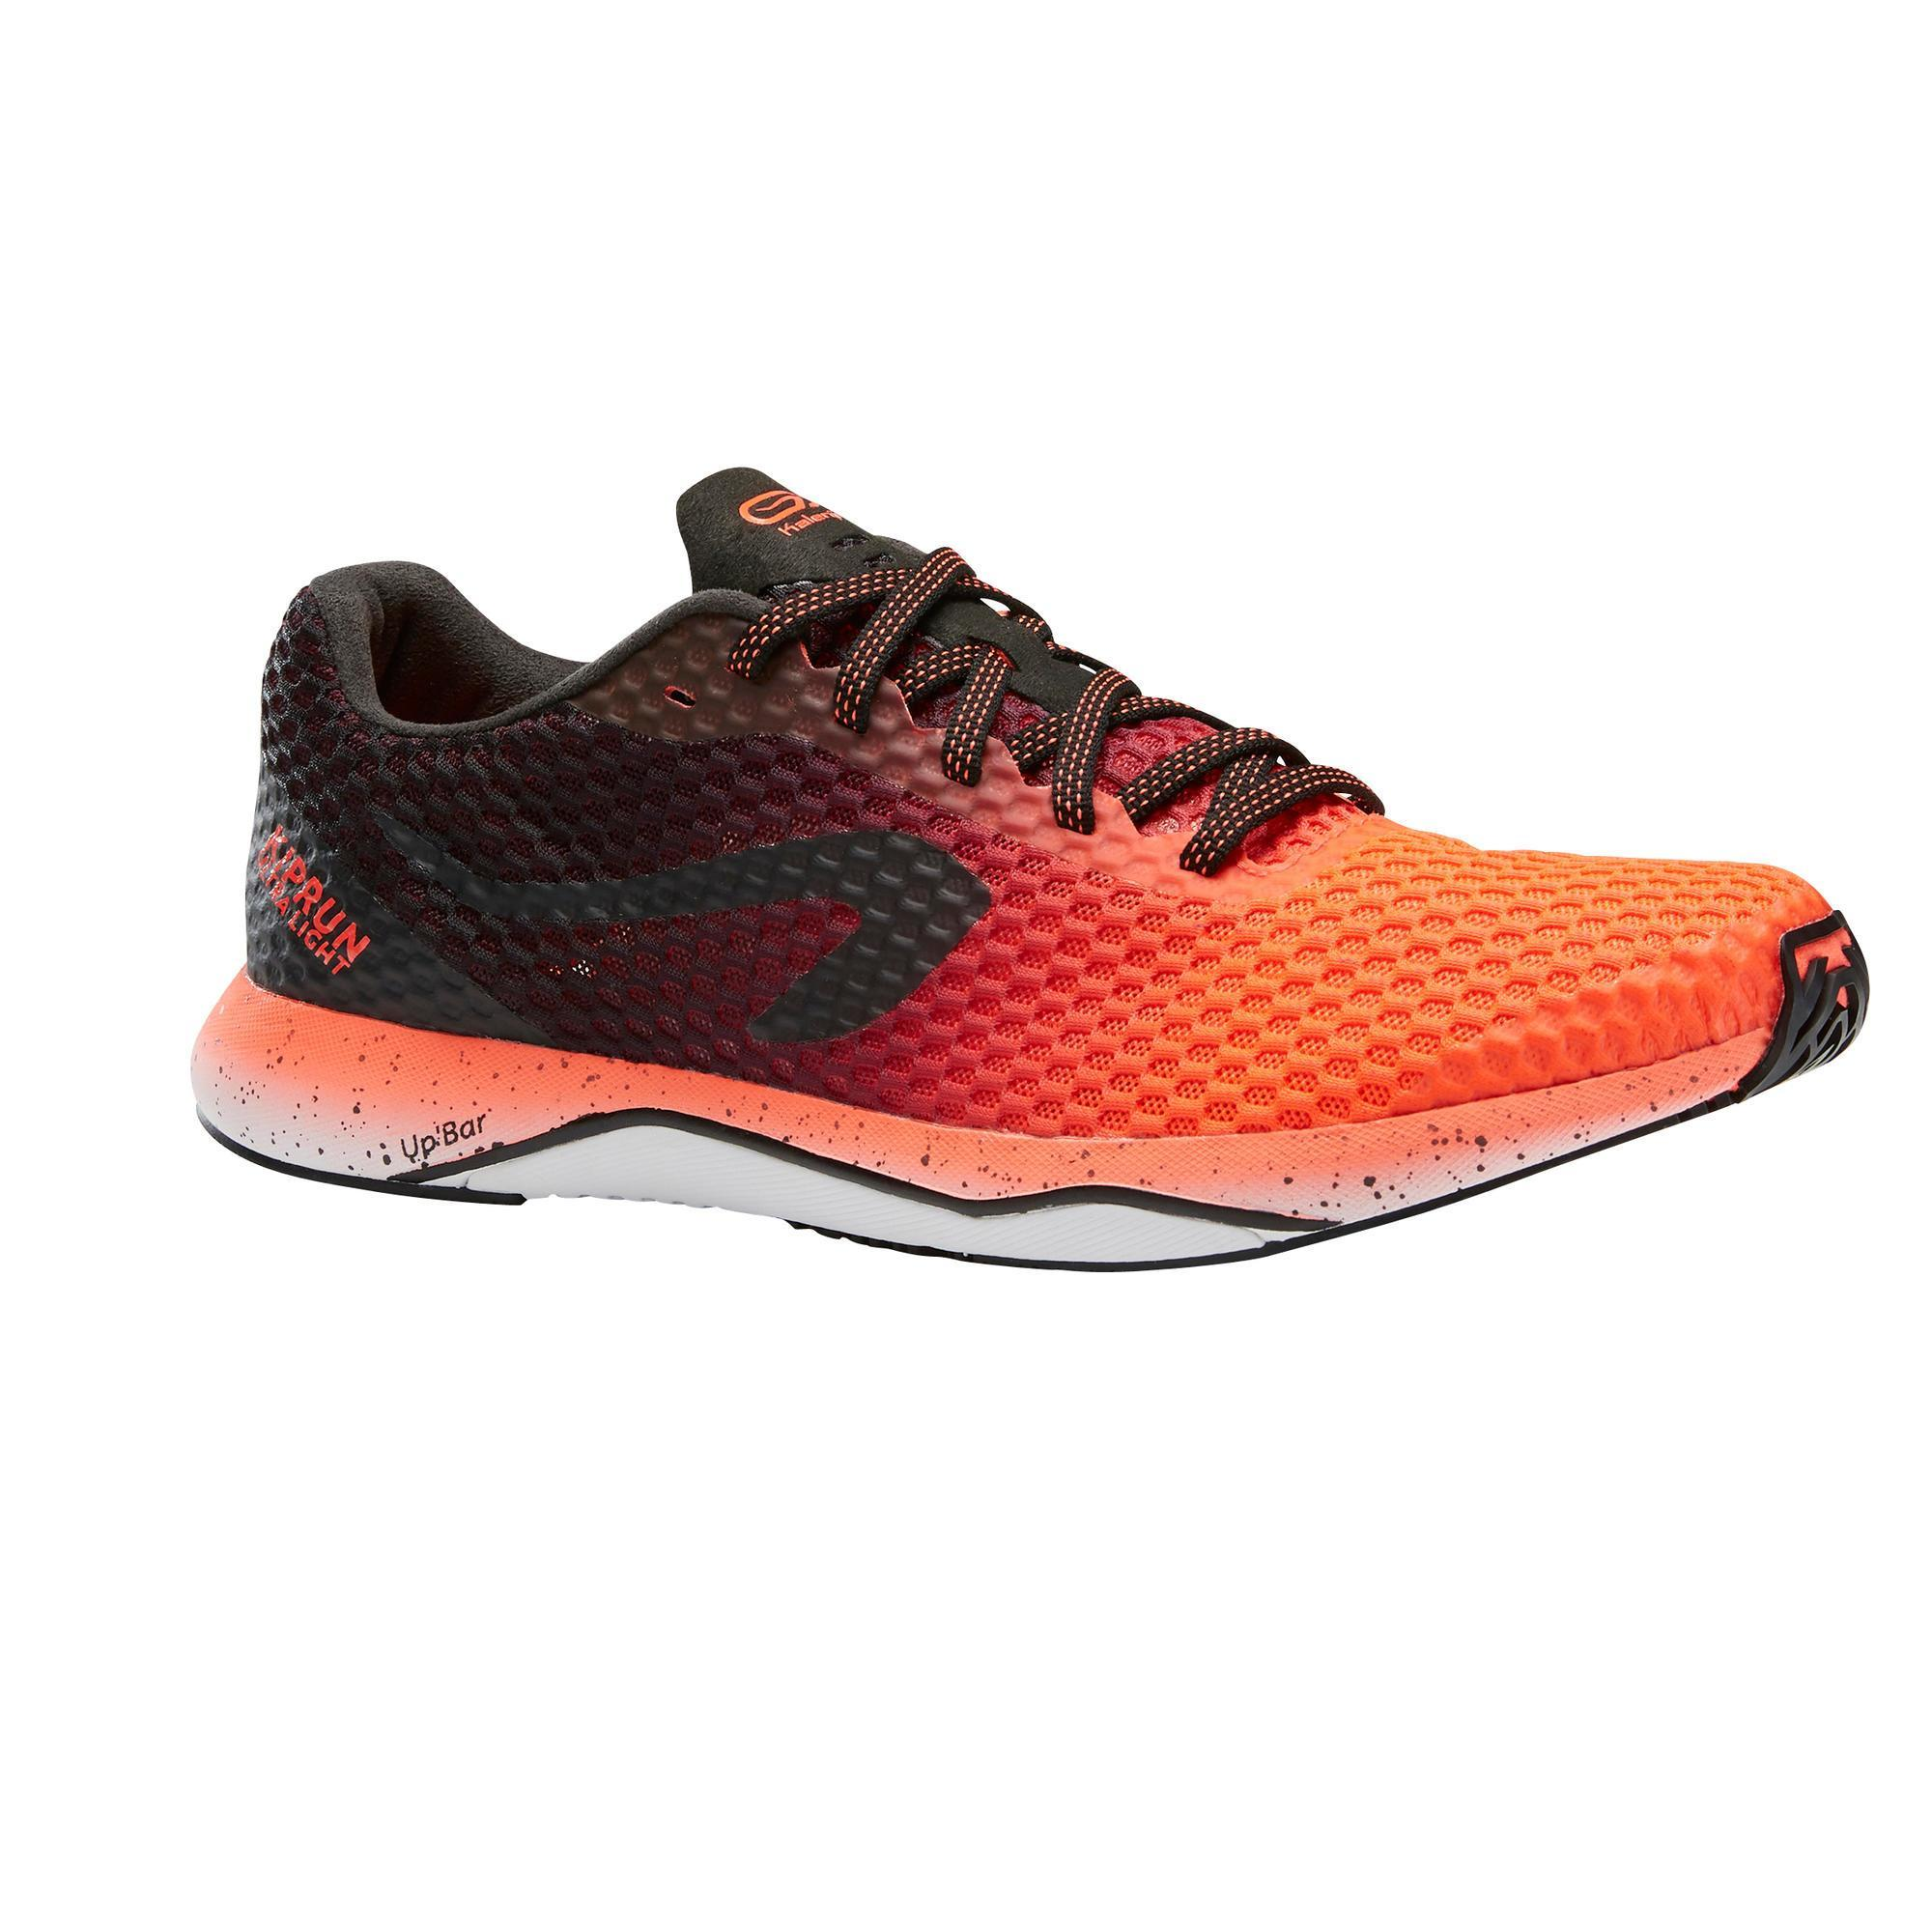 bons plans 2017 nouveau style Chaussures 2018 Kiprun Race Ultralight Men's Running Shoes Black/Red